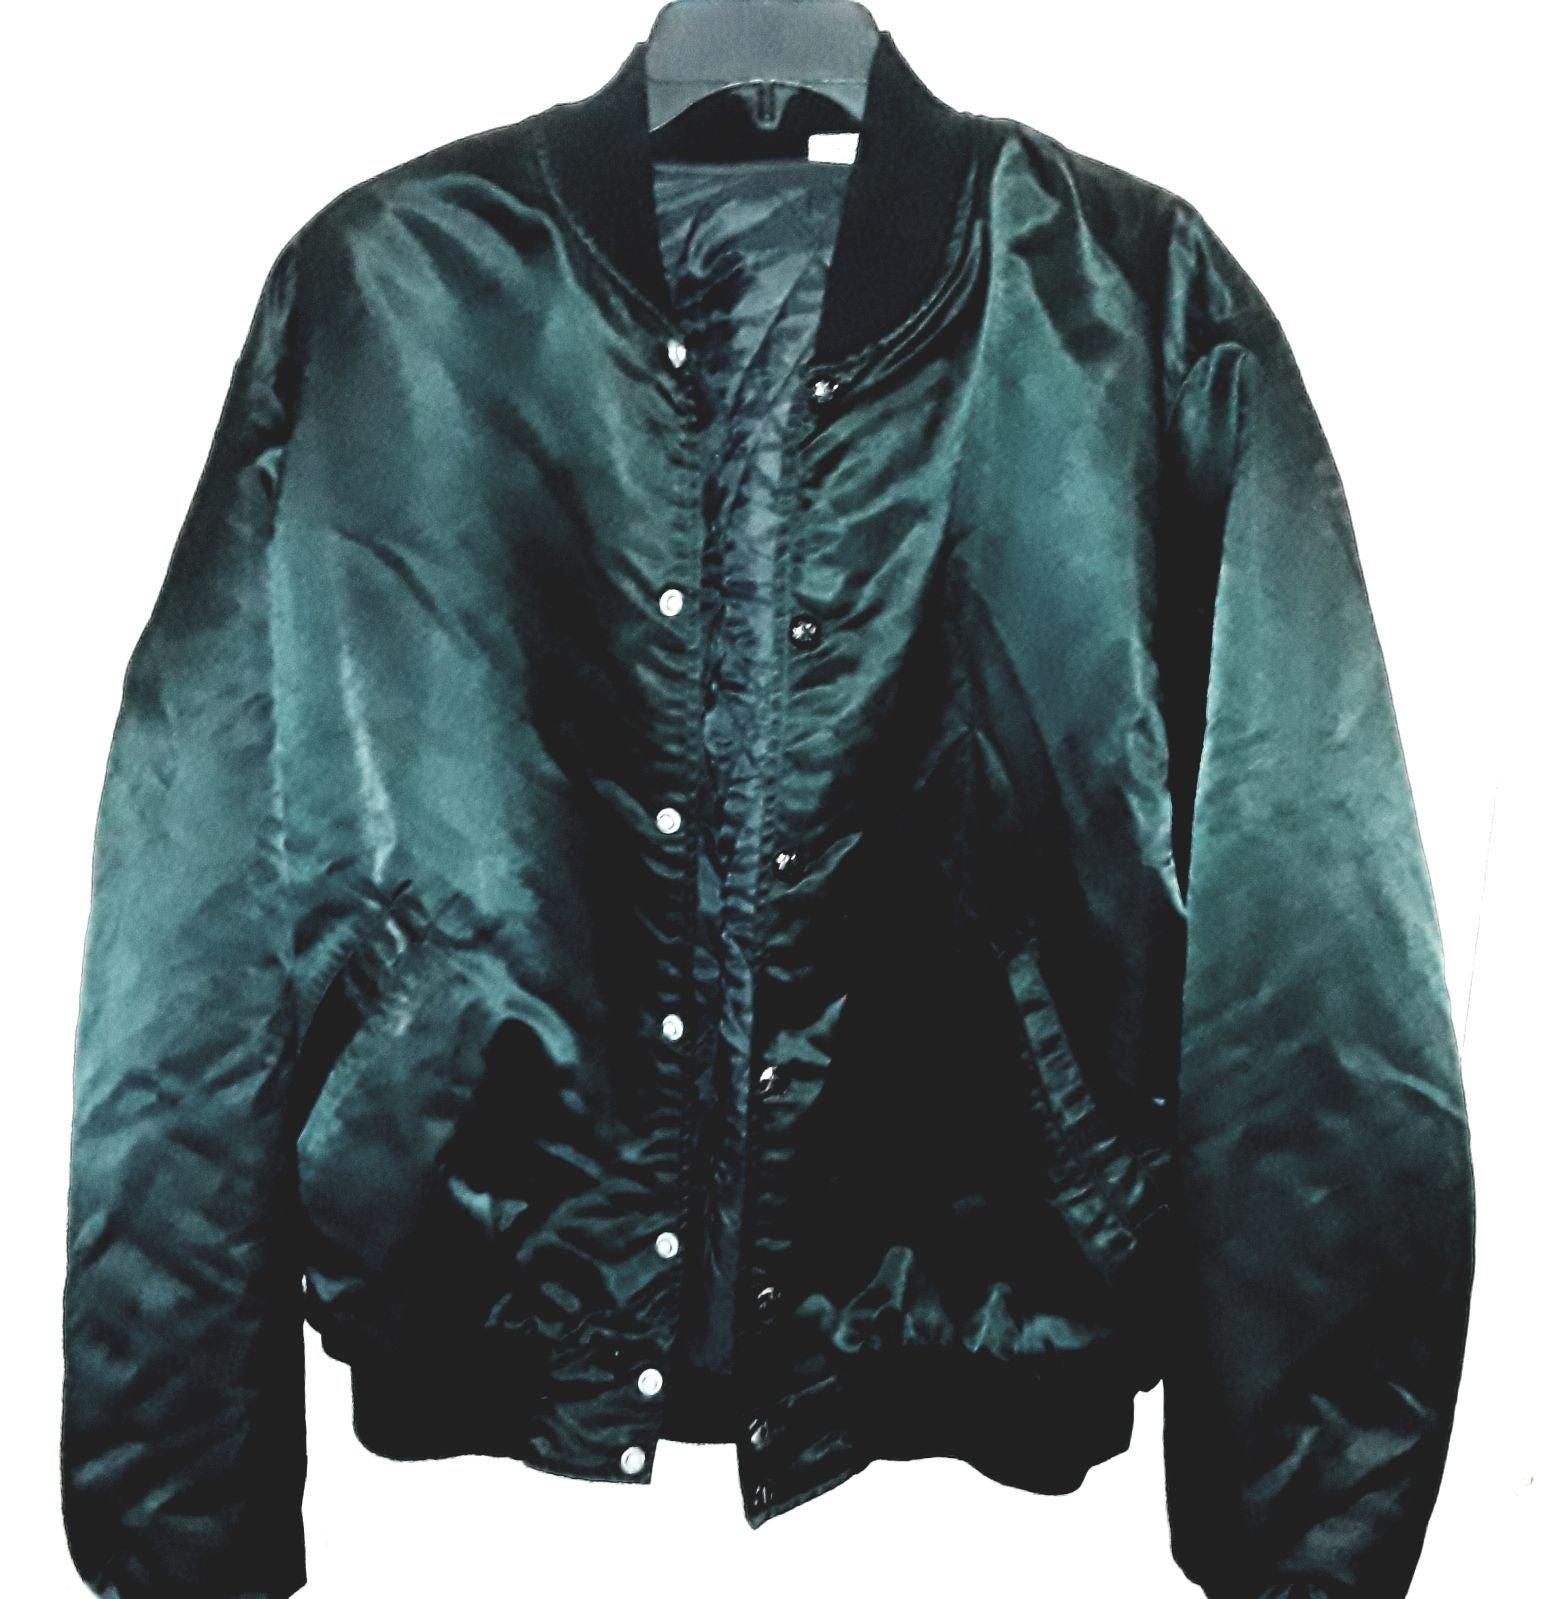 New black bomber ladies jacket